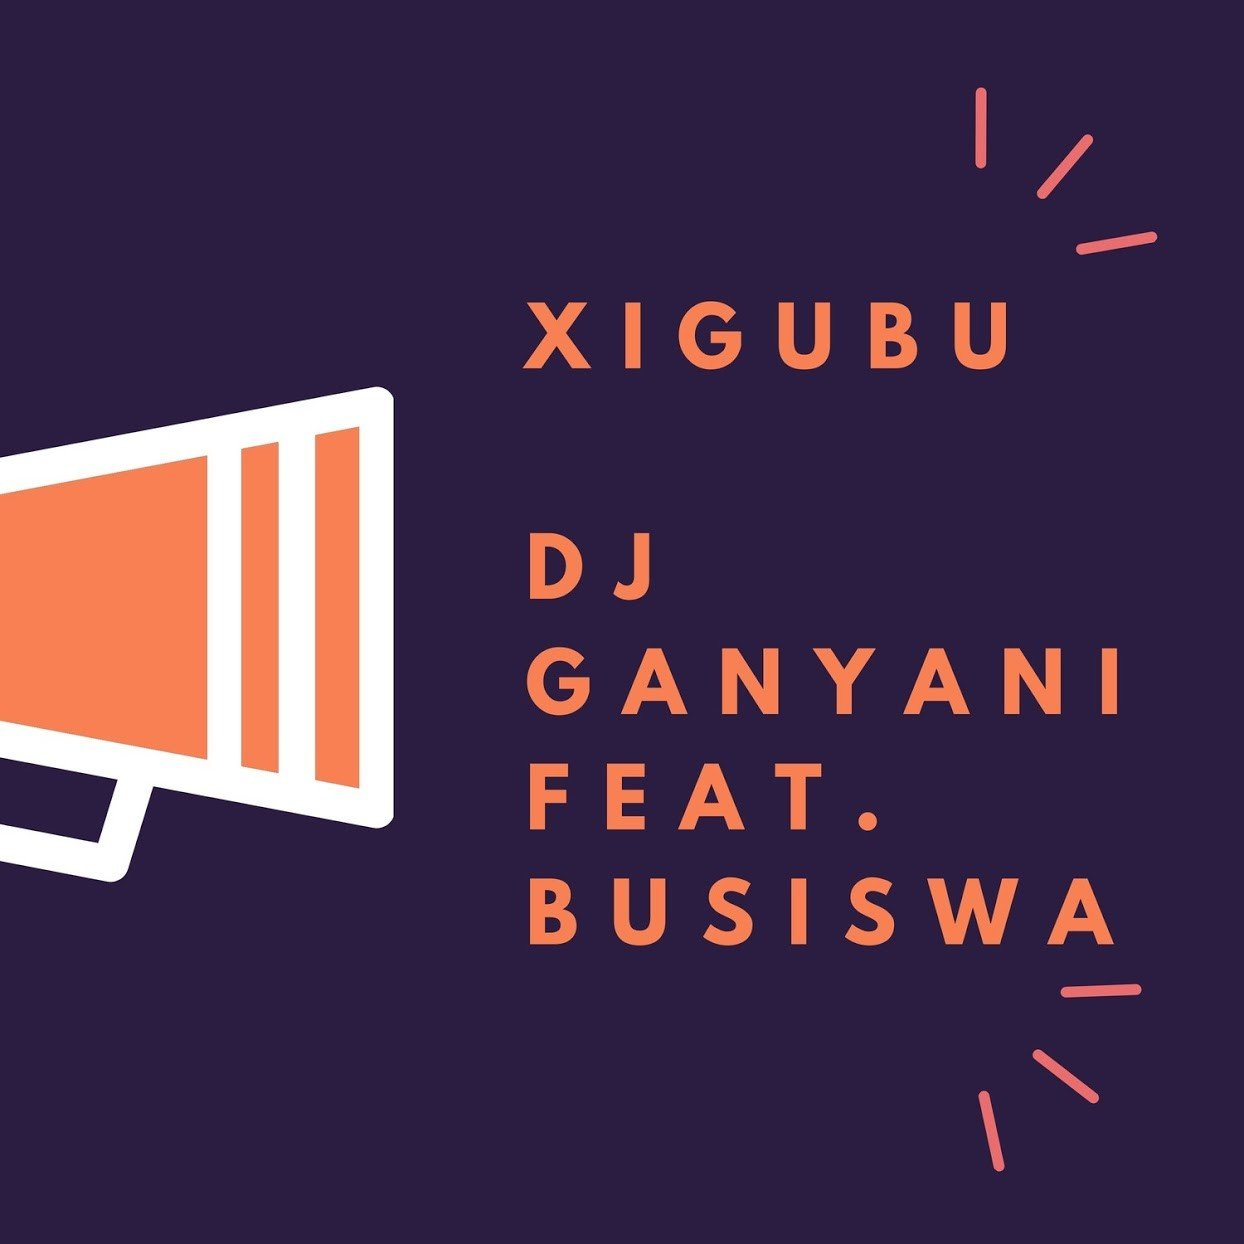 Dj Ganyani feat. Busiswa - Xigubu